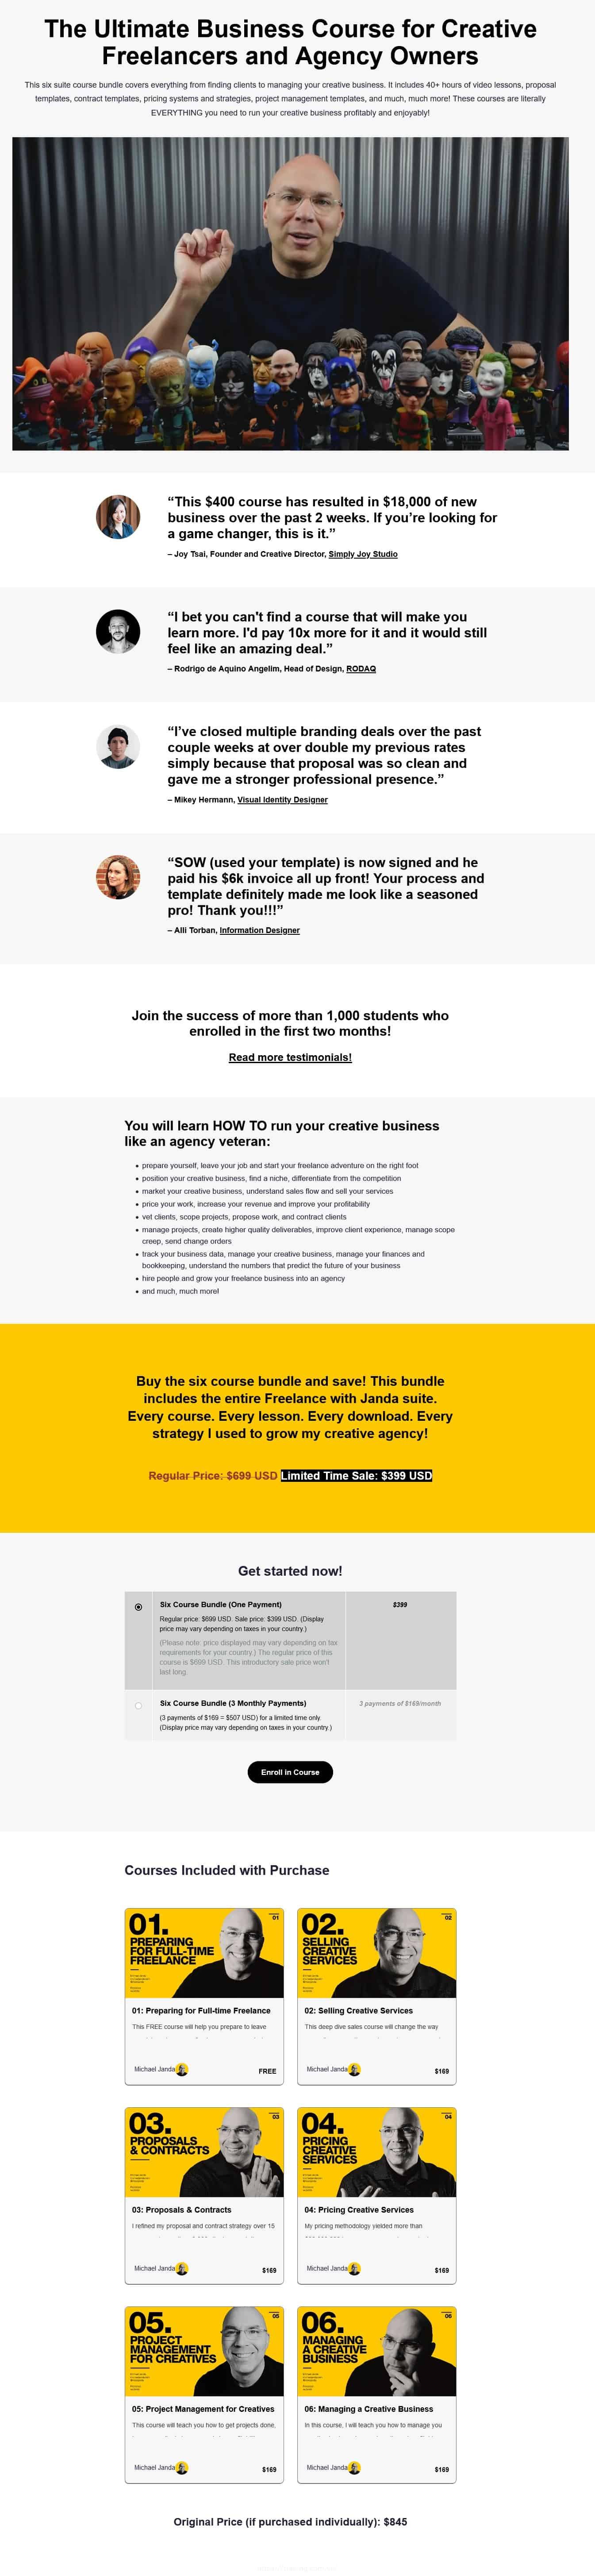 Freelance with Janda Six Course Bundle Sales Page